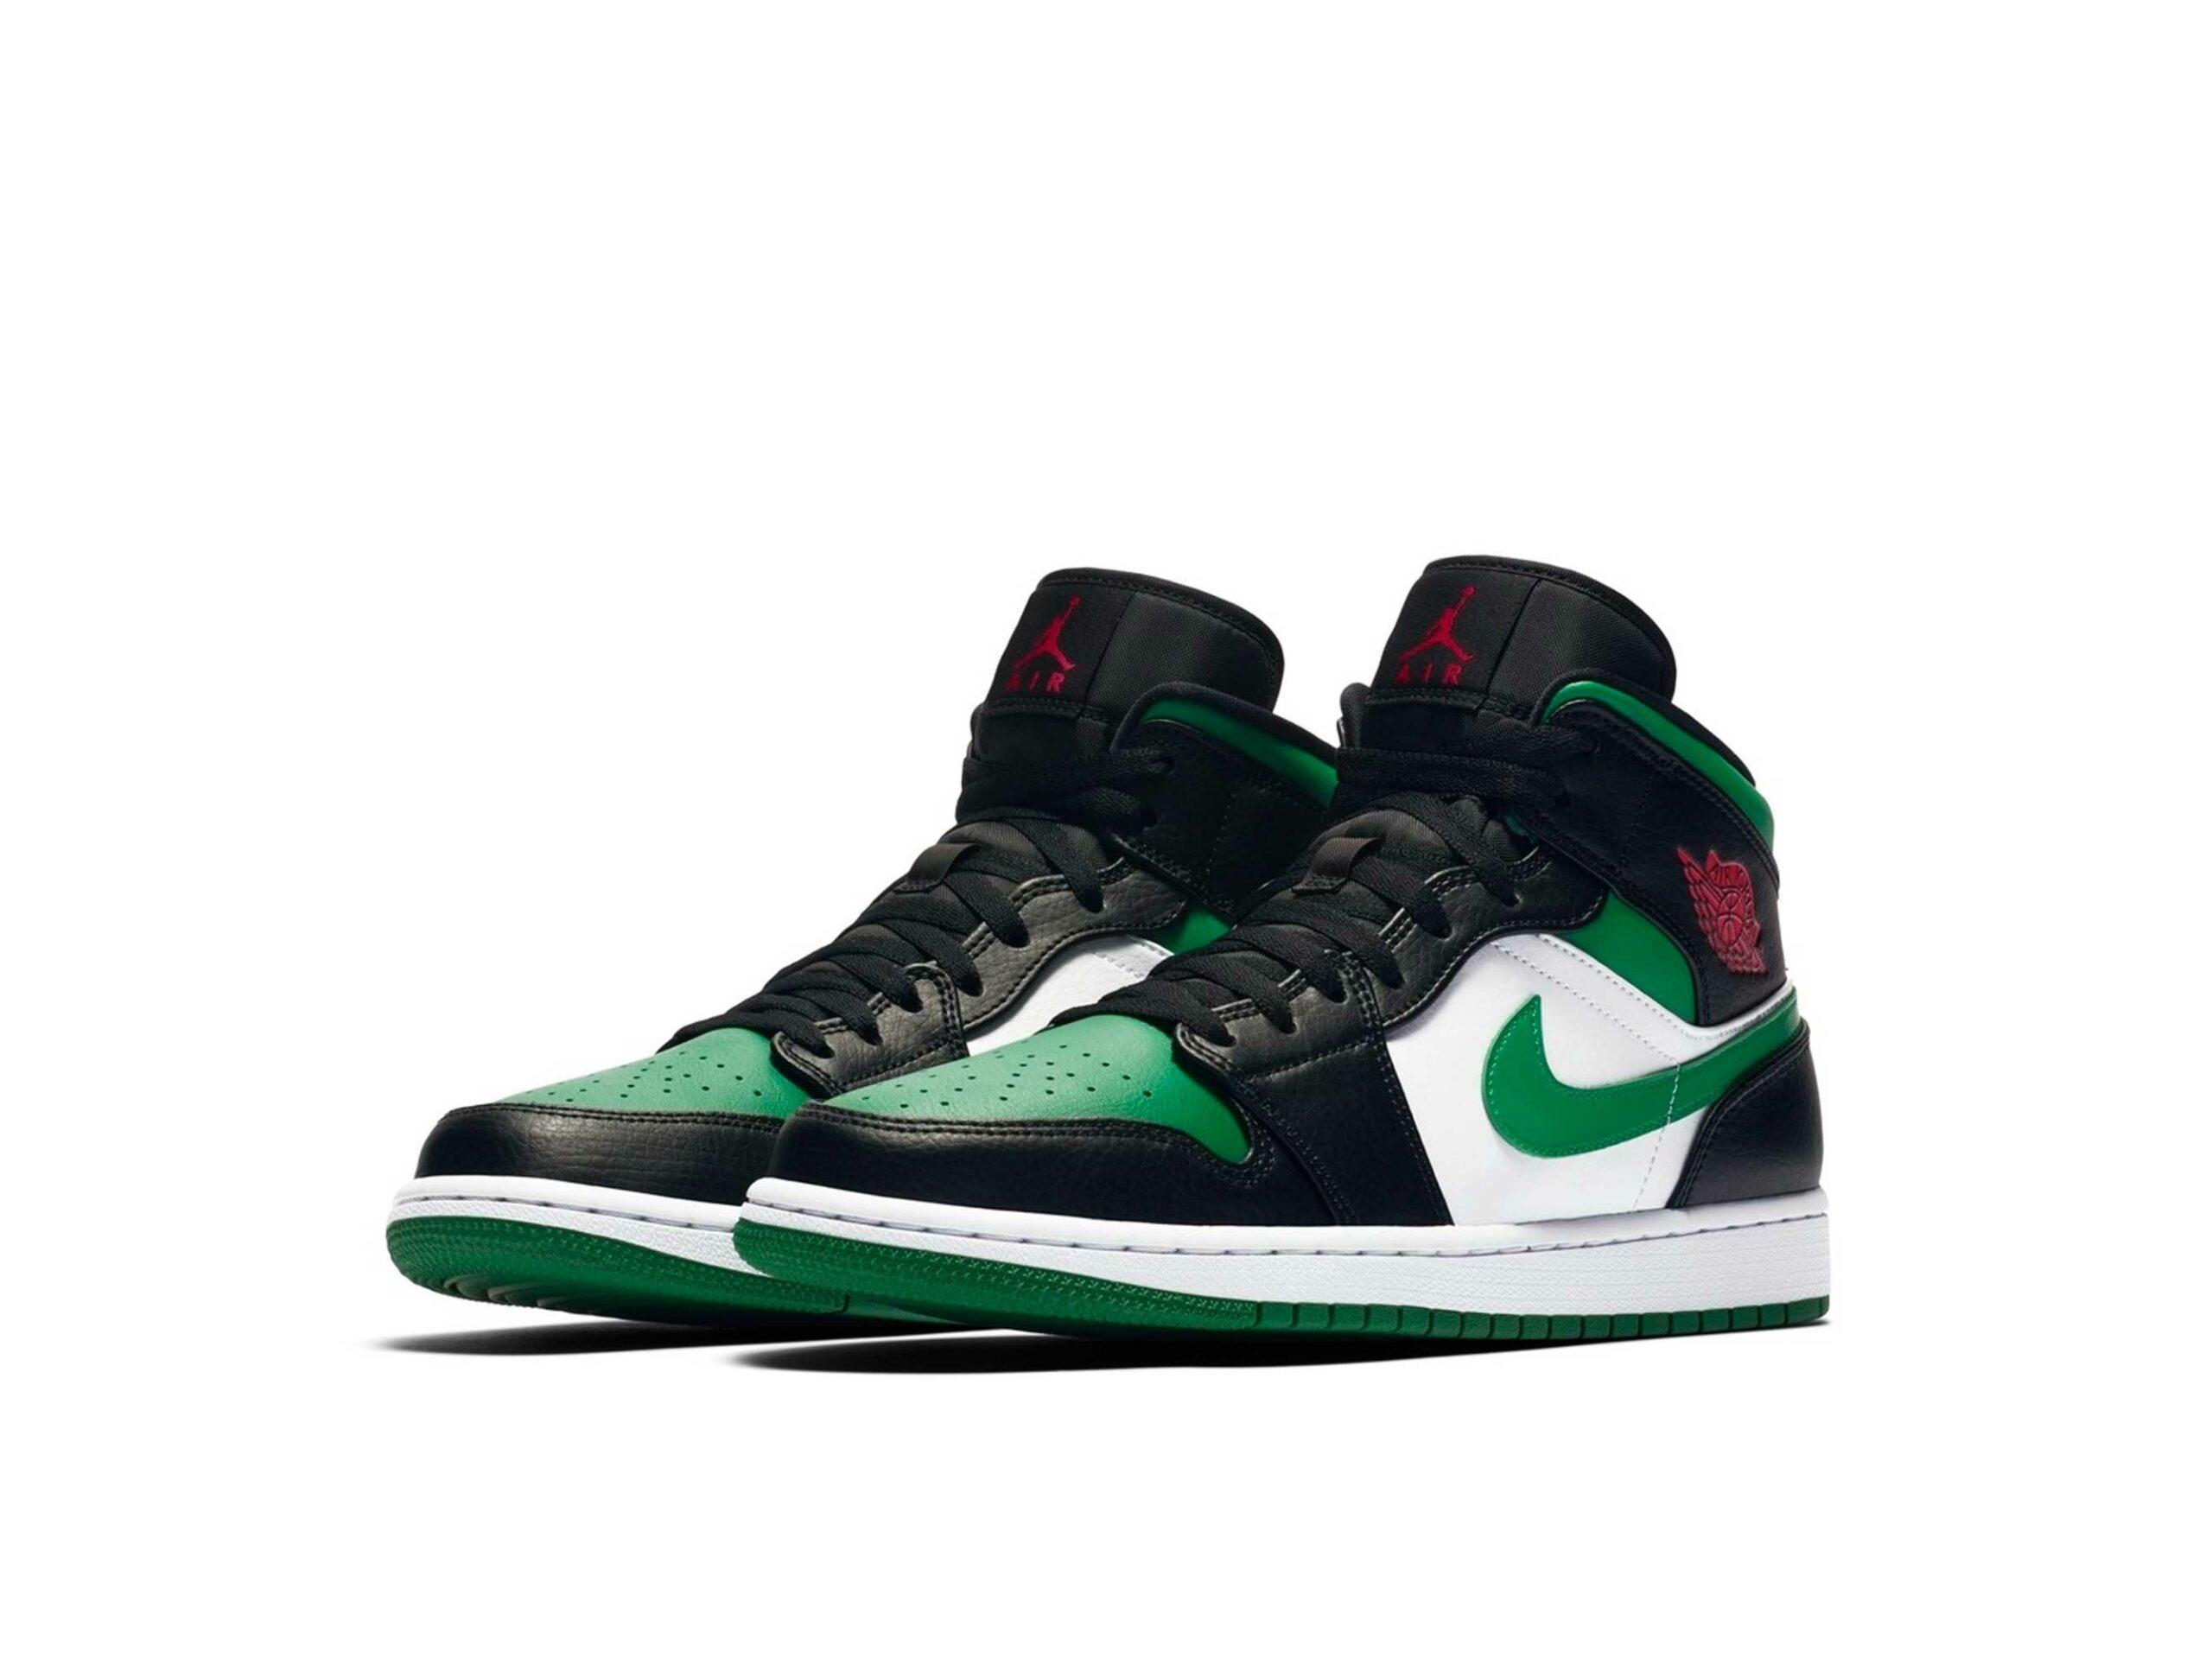 nike air Jordan 1 mid pine green black 554724_067 купить